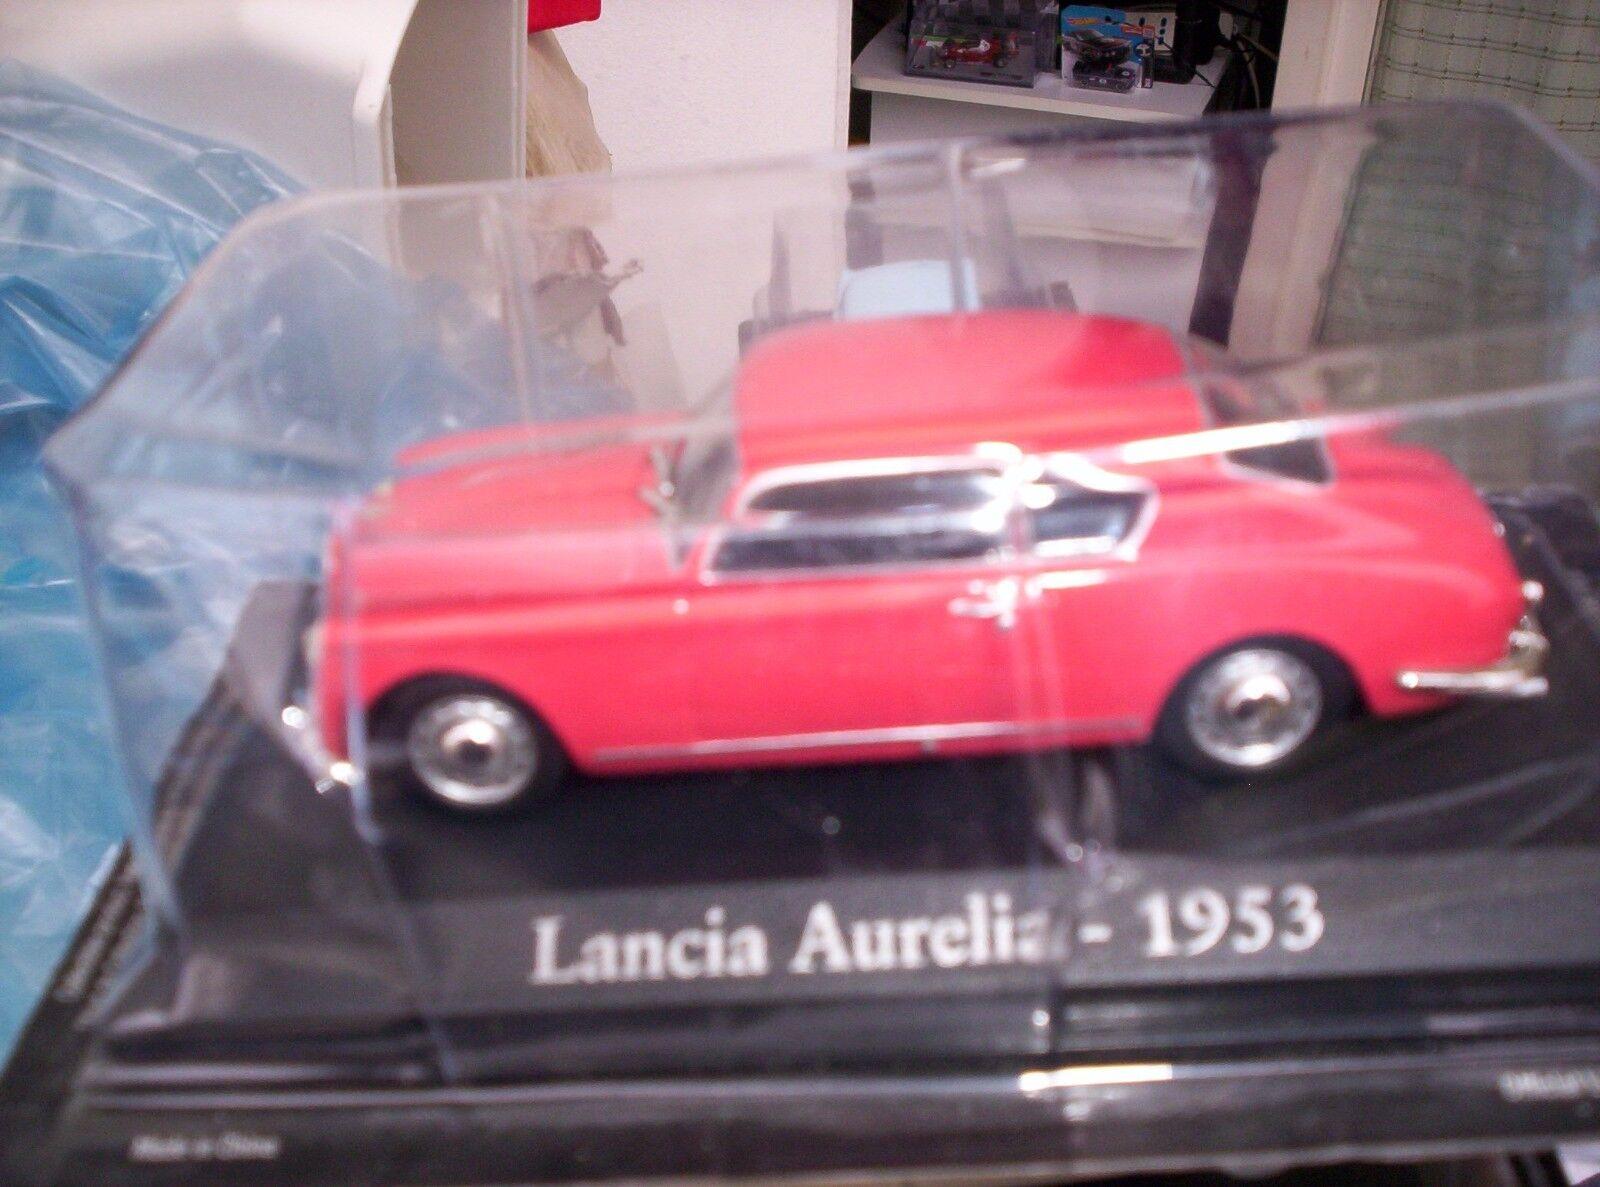 LANCIA AURELIA - 1953 1953 1953 - SCALA 1 43  precios mas baratos